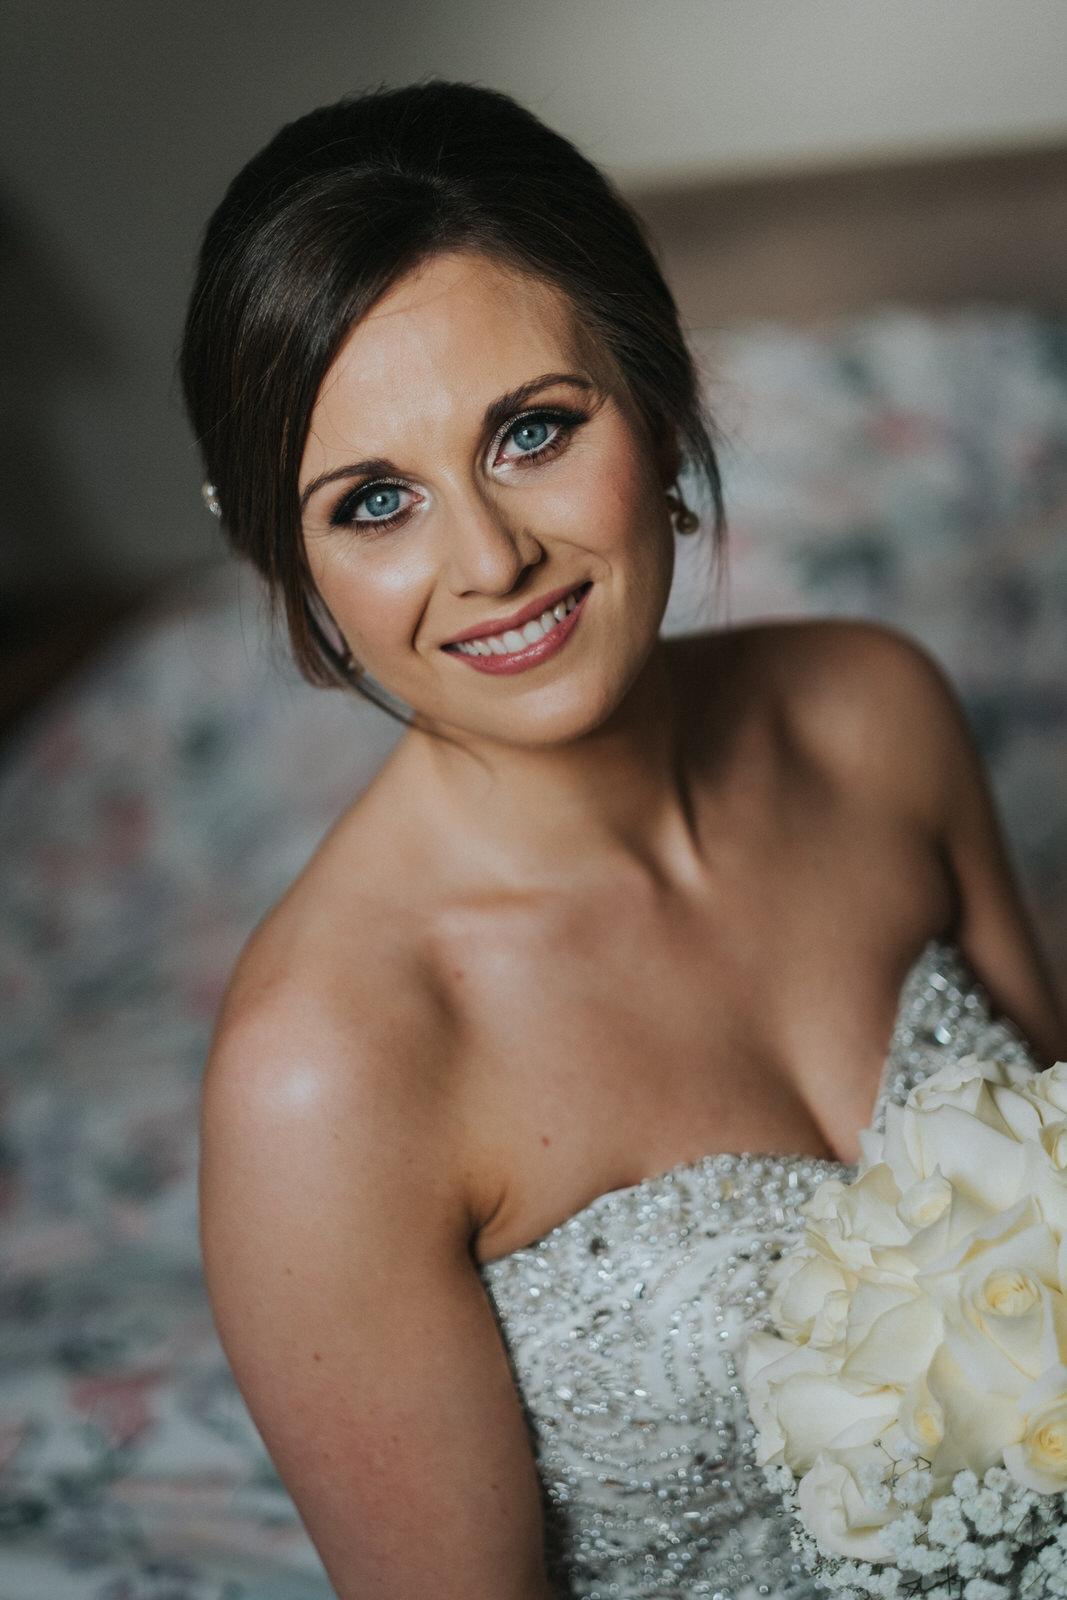 Clonabreany_wedding-photographer_roger_kenny_ireland_022.jpg